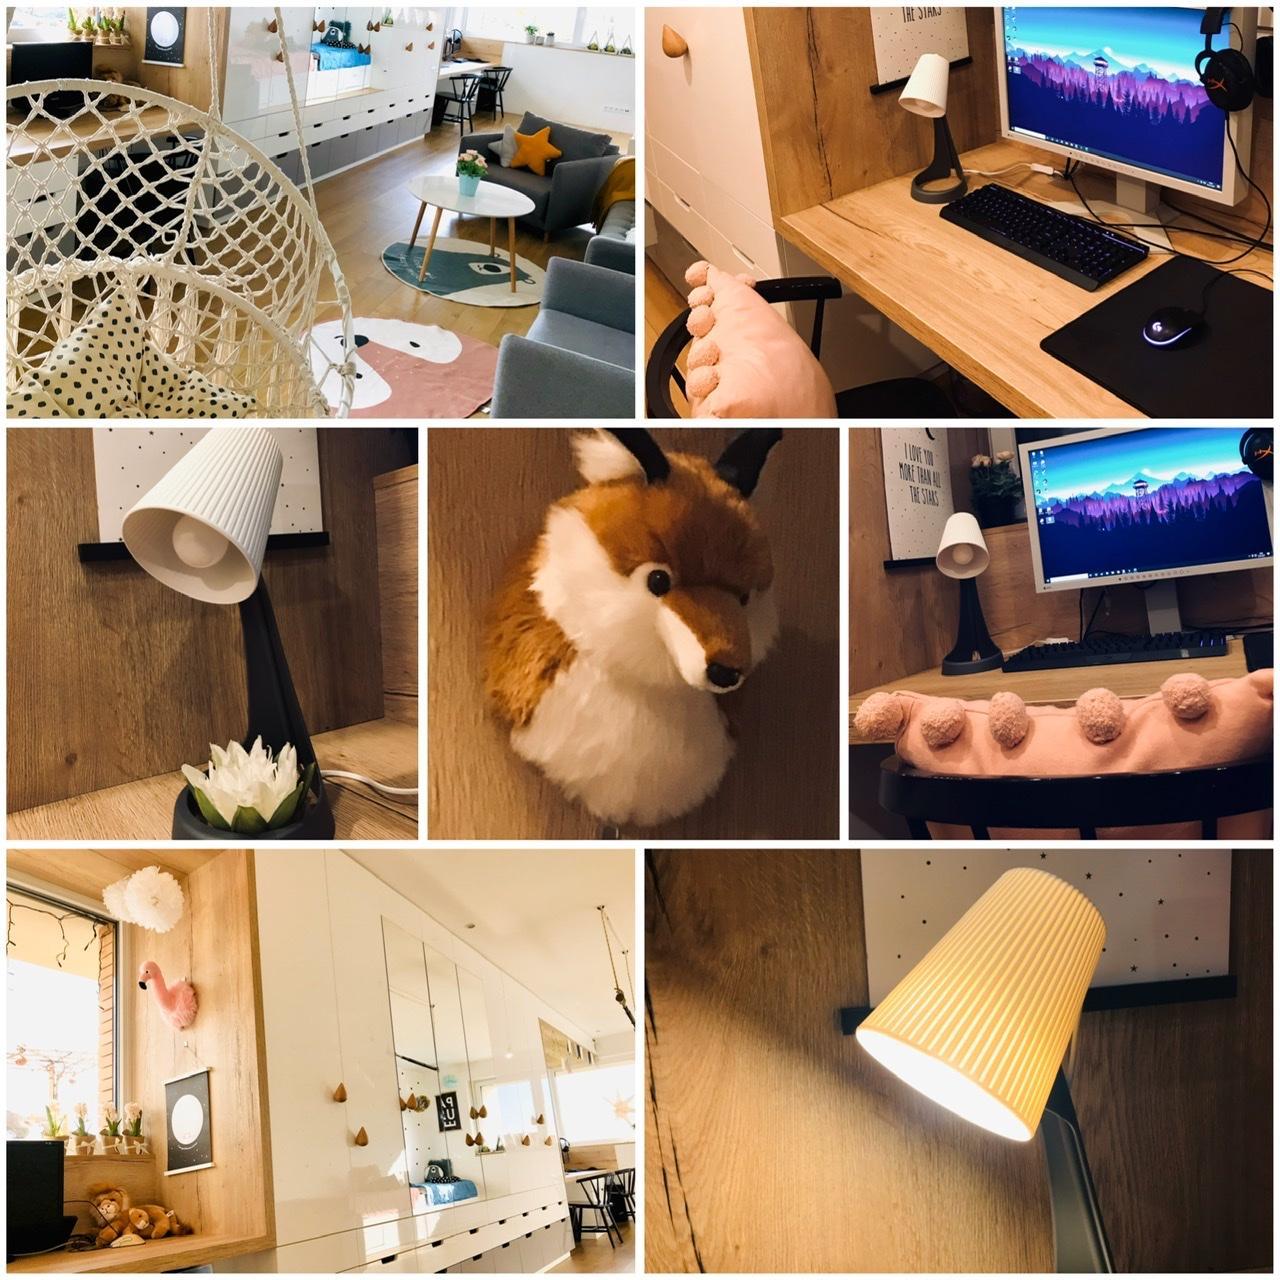 Naše L-ko - 2021 - stále dokončujeme - Detská izba - deťom v izbičke pribudli nové stolové lampy -  horný kryt po rozsvietení posobí ako jemný papierový